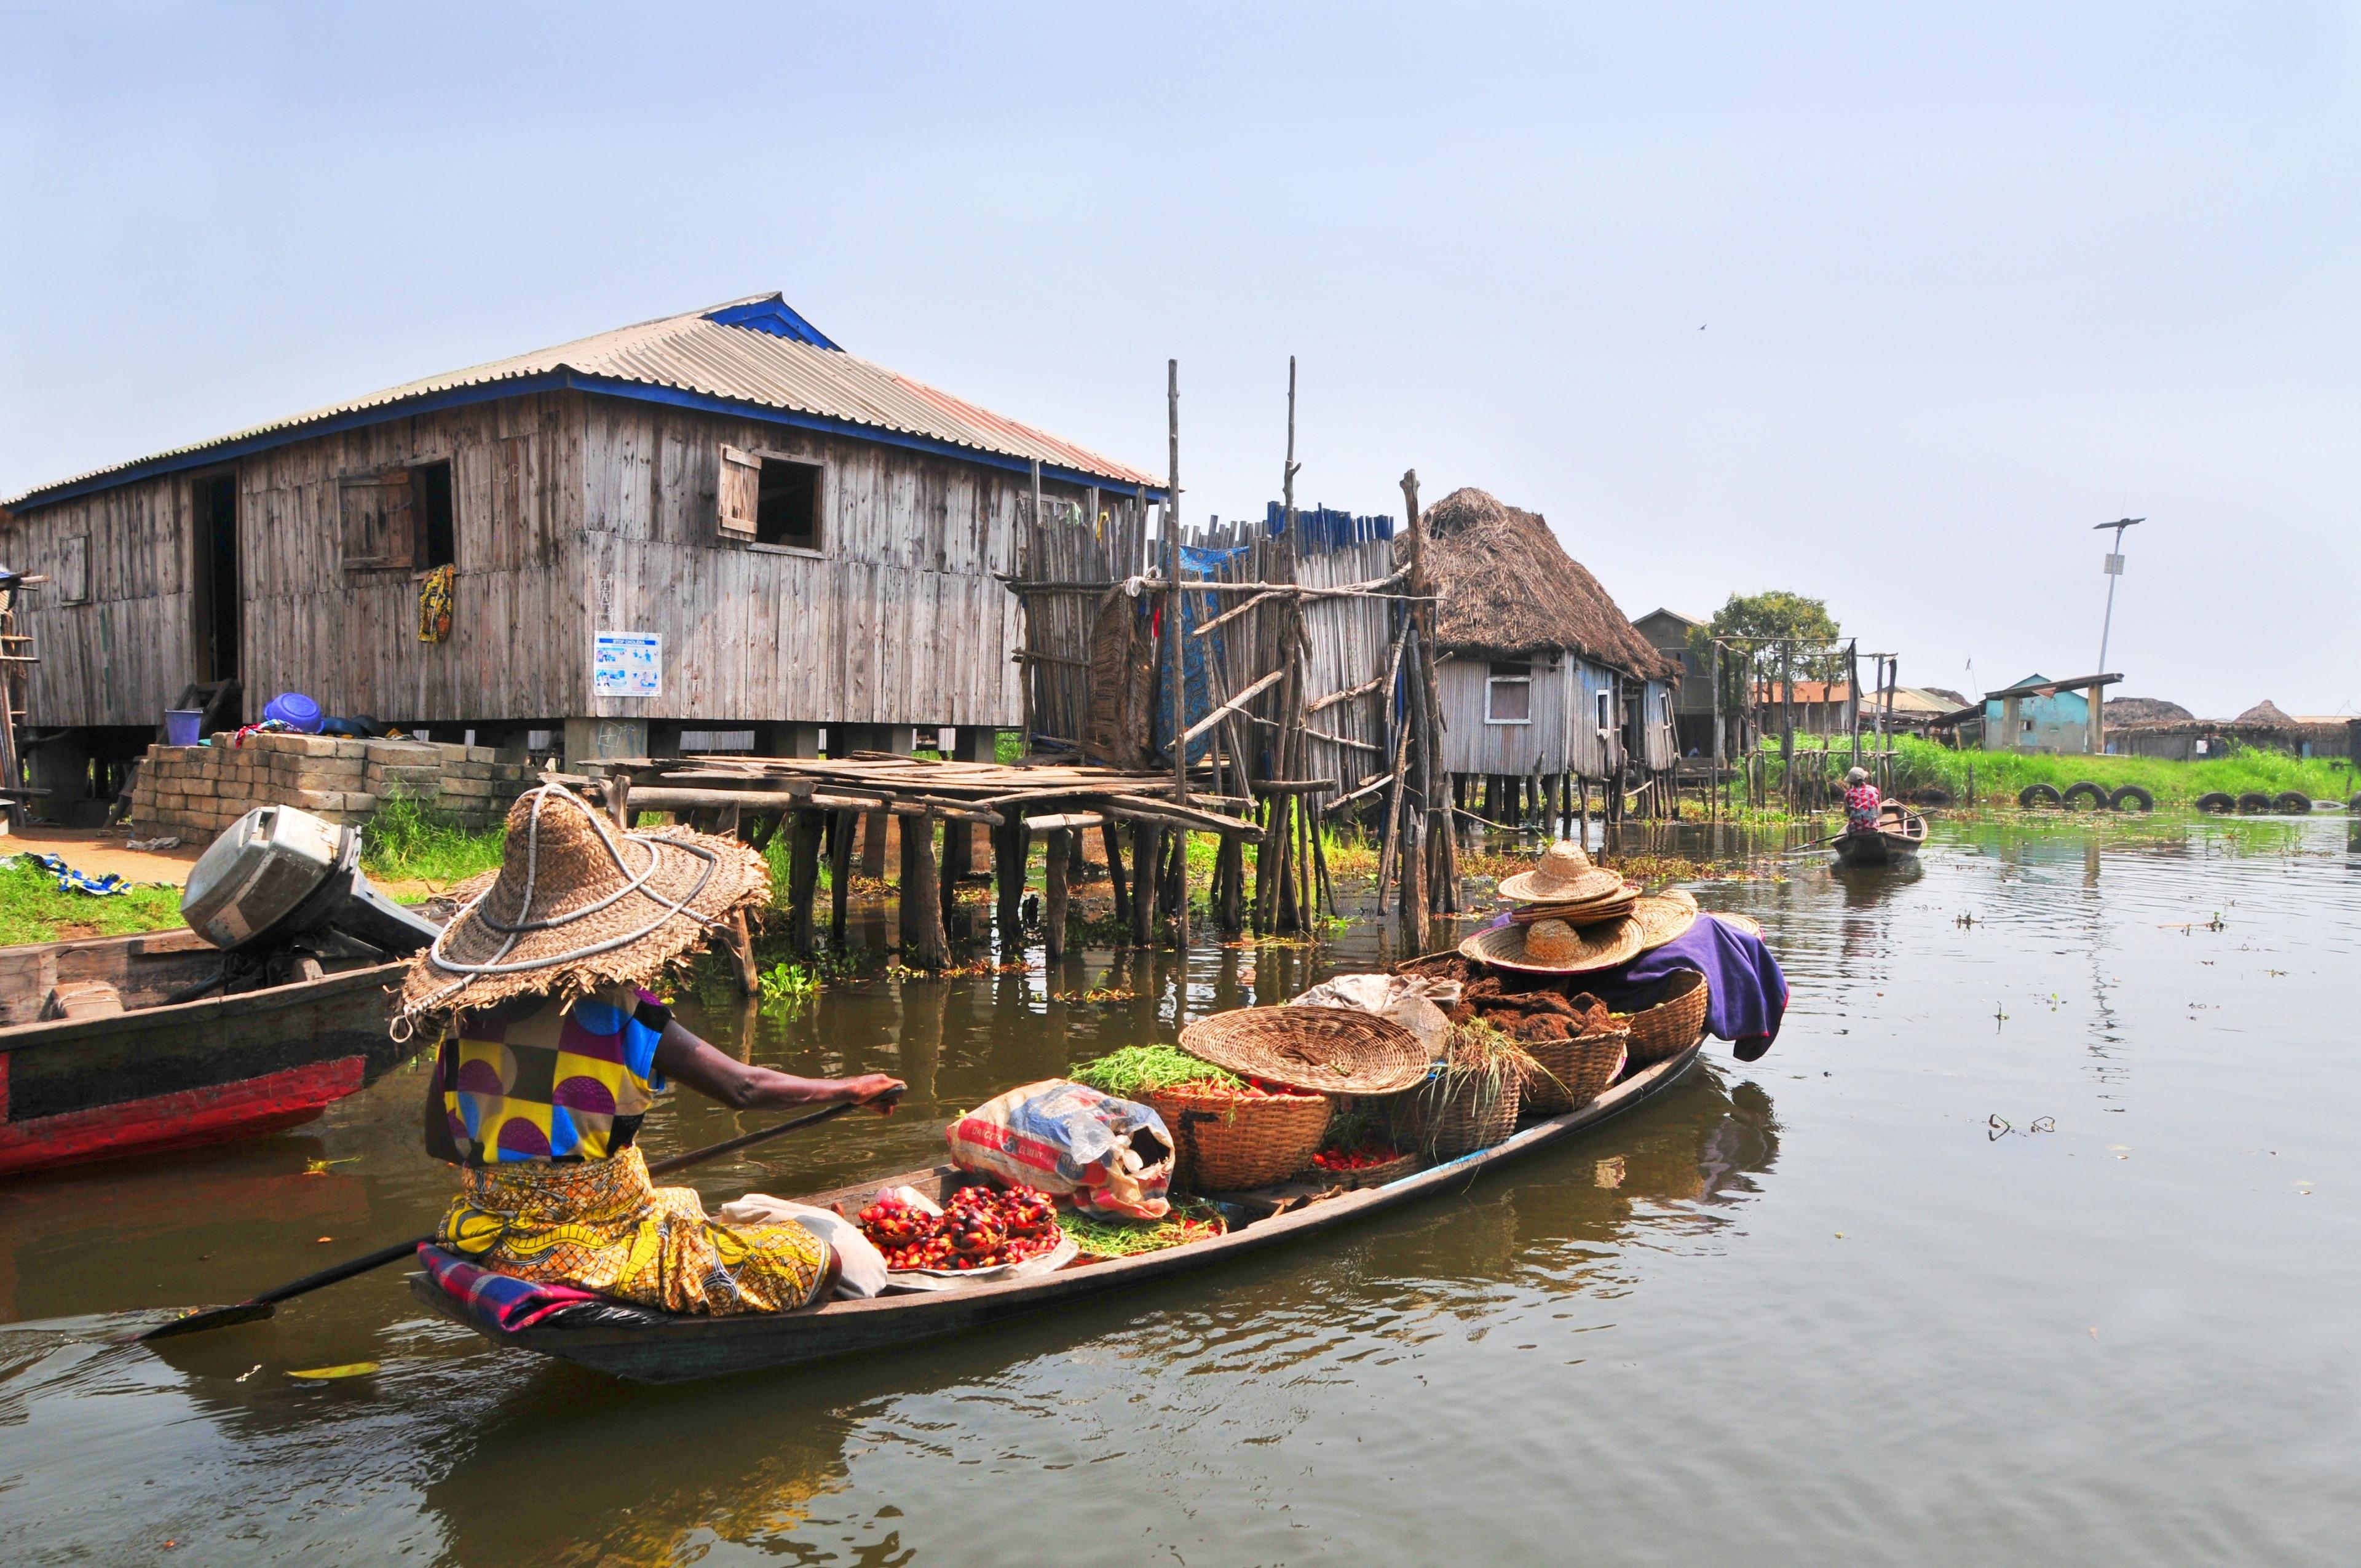 Littoral, Benin